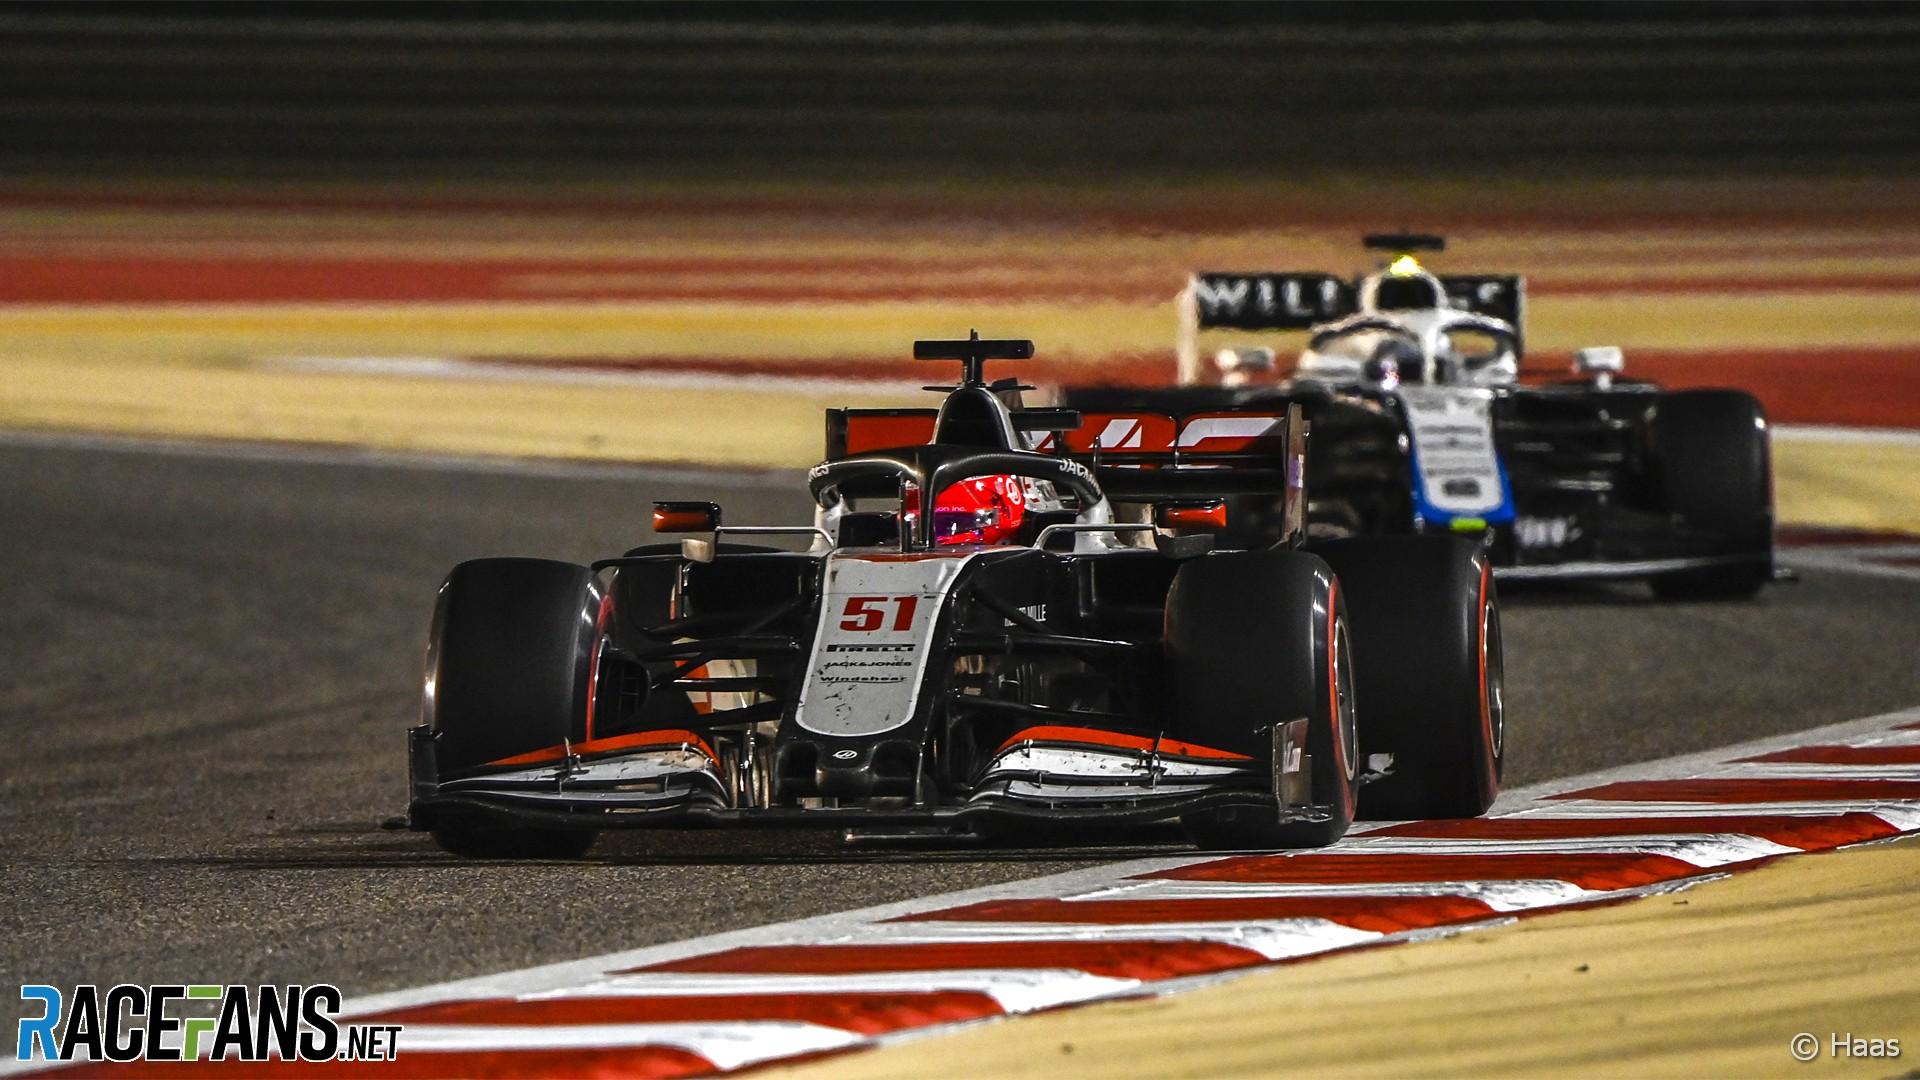 Pietro Fittipaldi, Haas, Bahrain, 2020